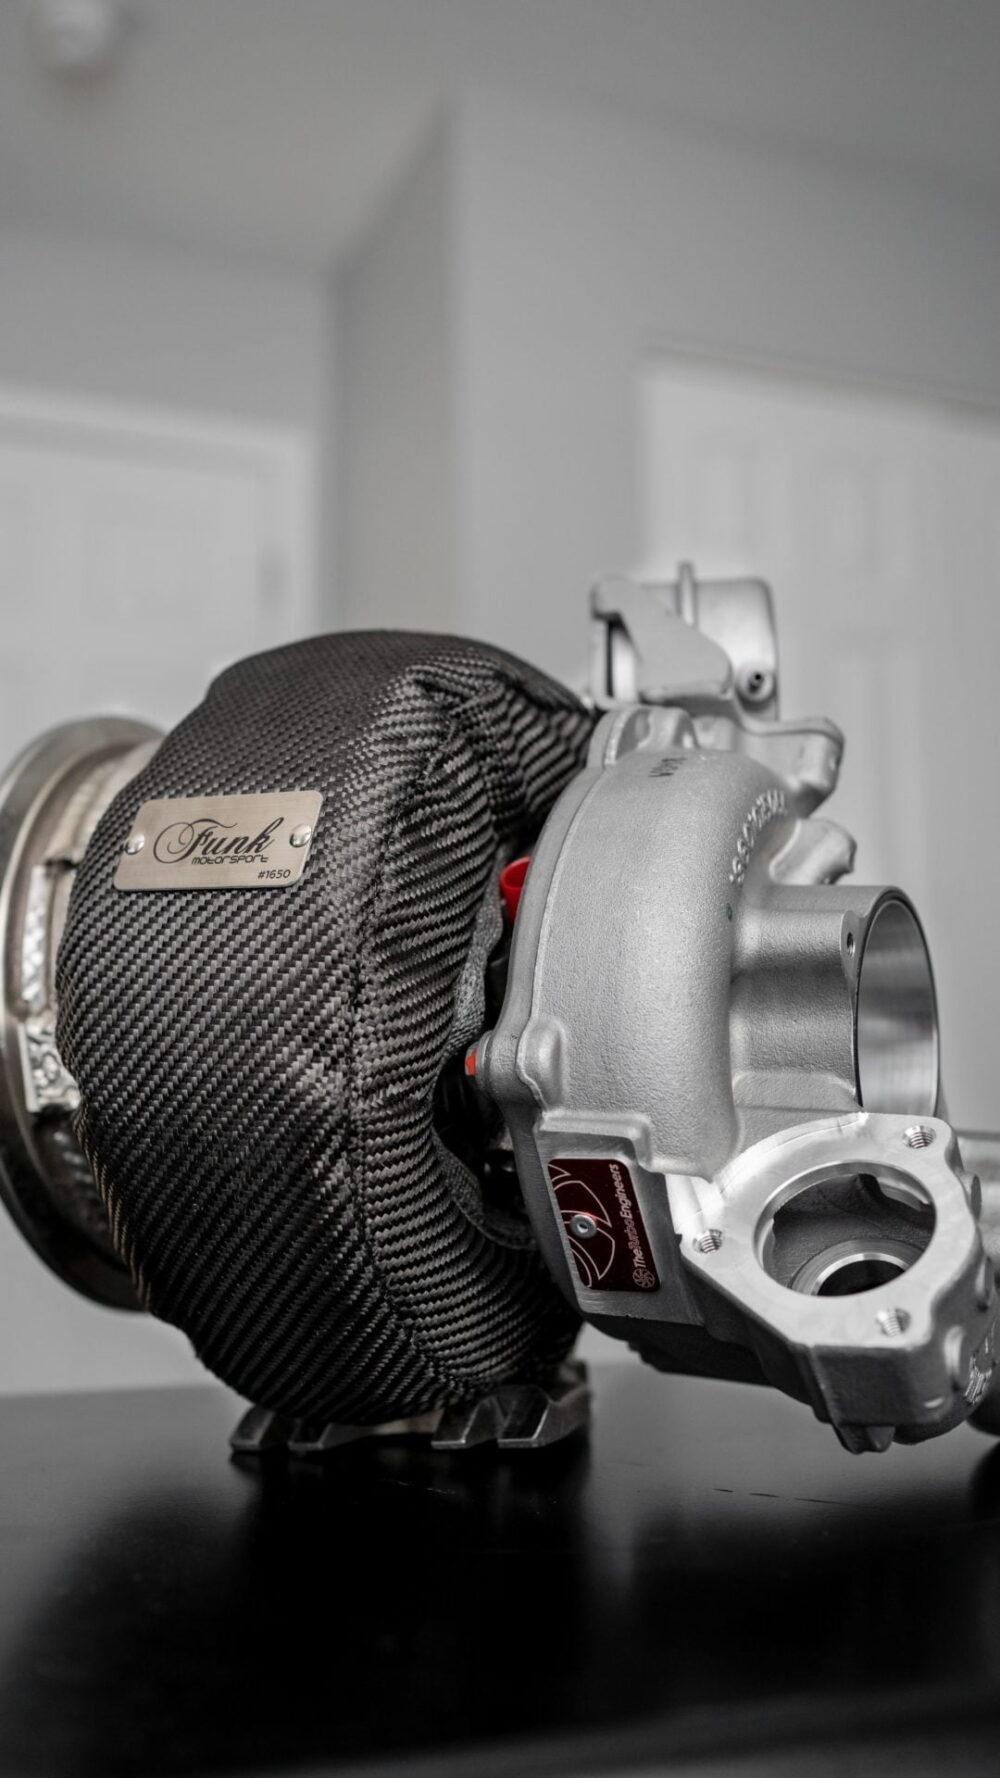 Audi B9 S4 Turbo Blanket by Funk motorsport